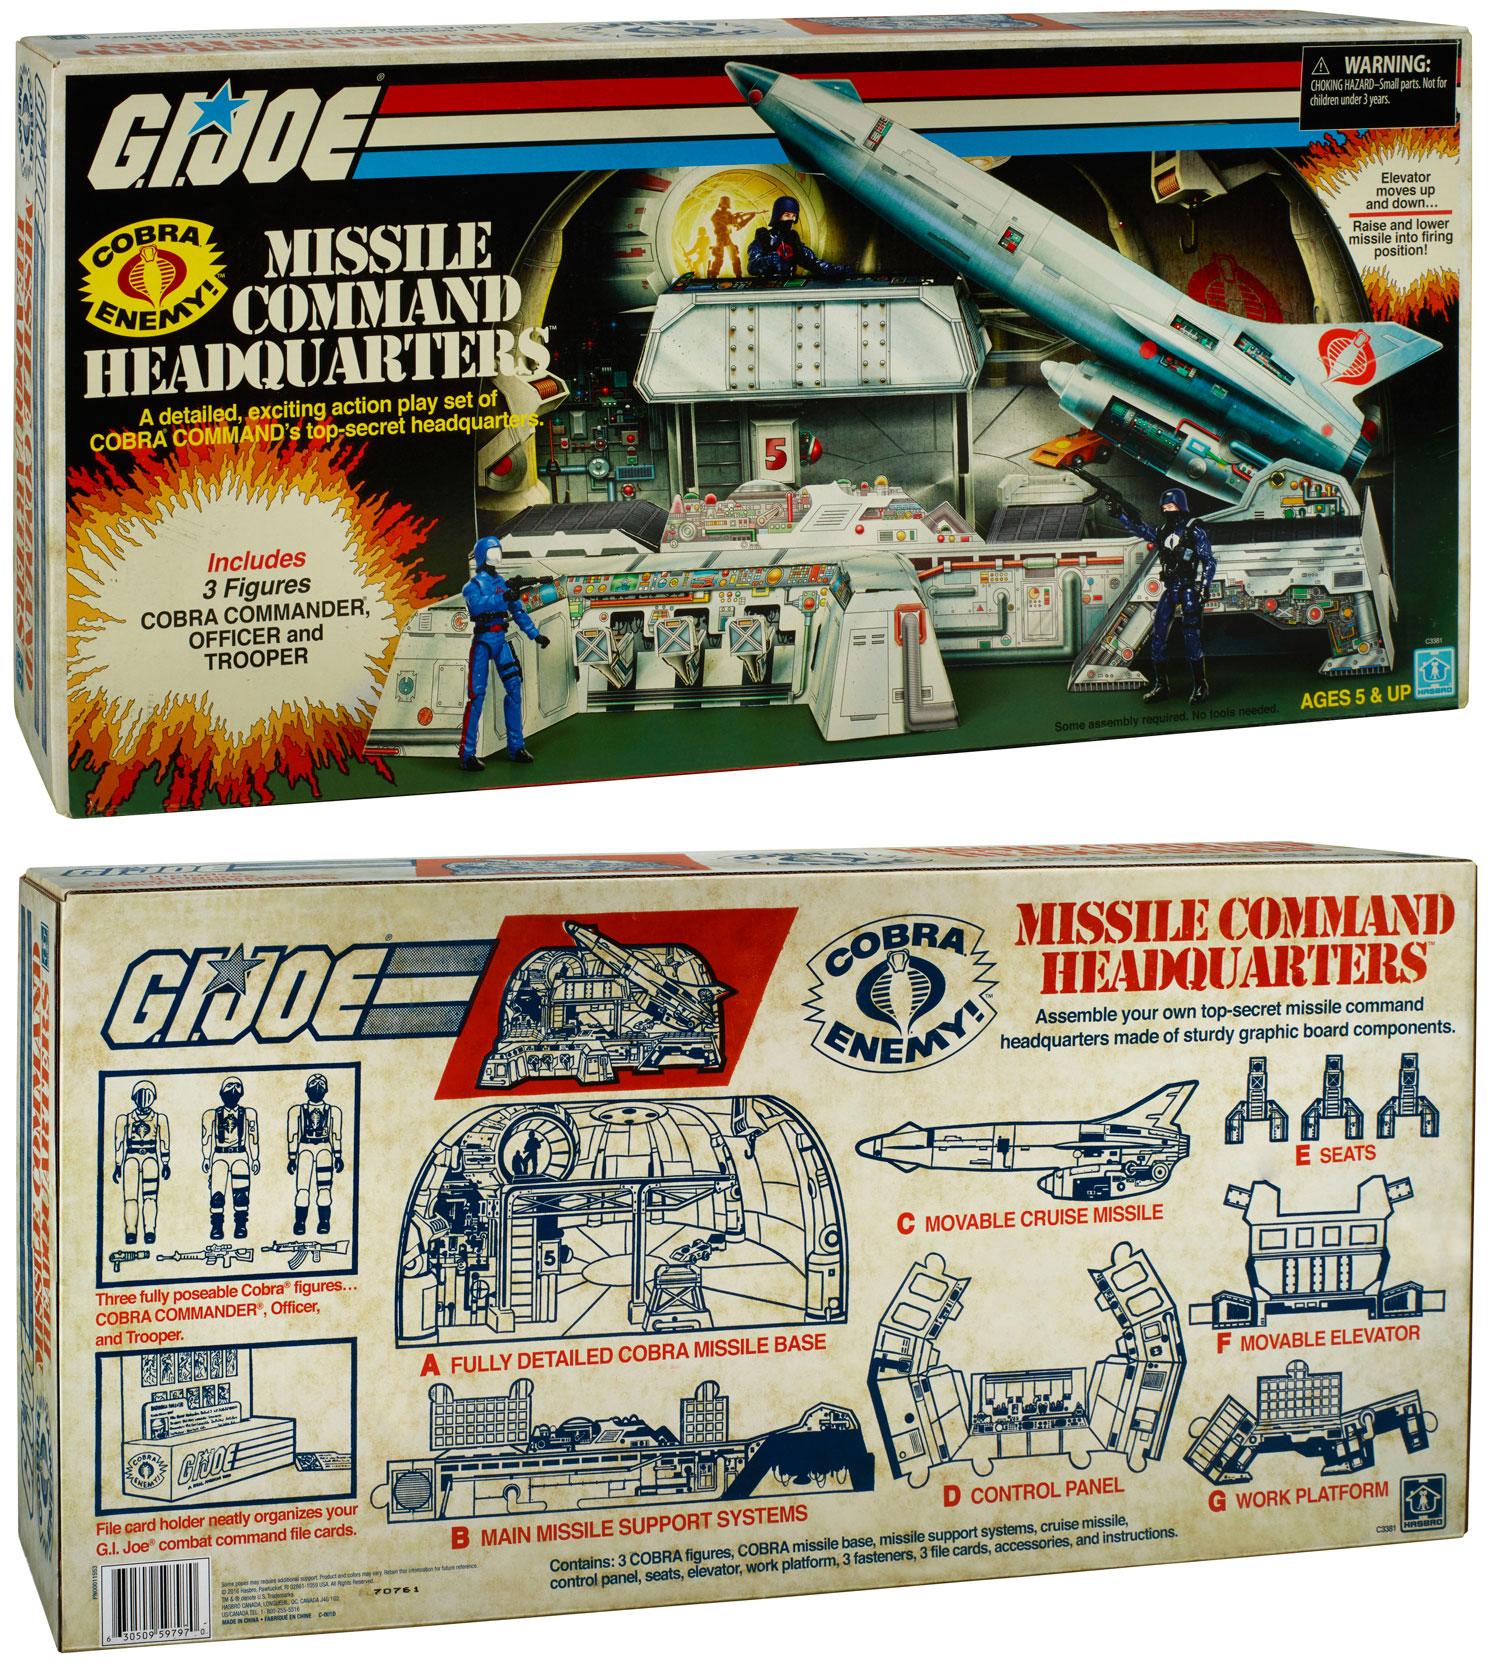 gi-joe-cobra-missile-command-headquarters-sdcc-2017-exclusive-2